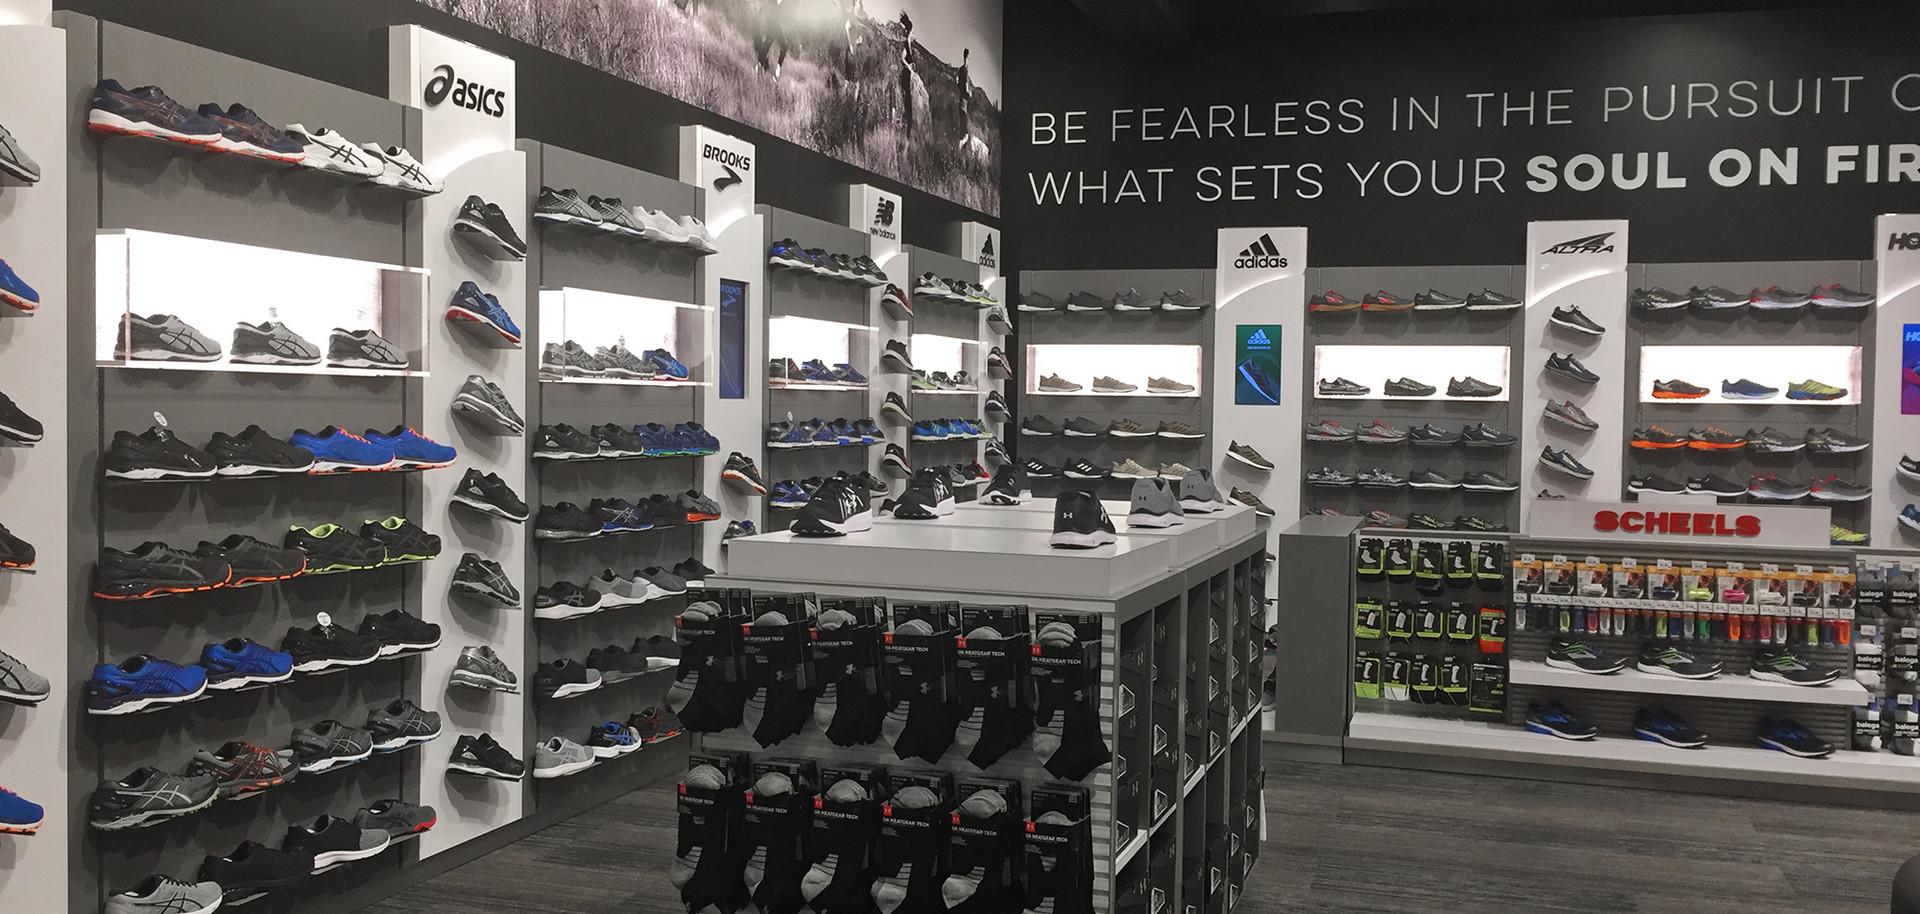 Scheels Brand footwear wall